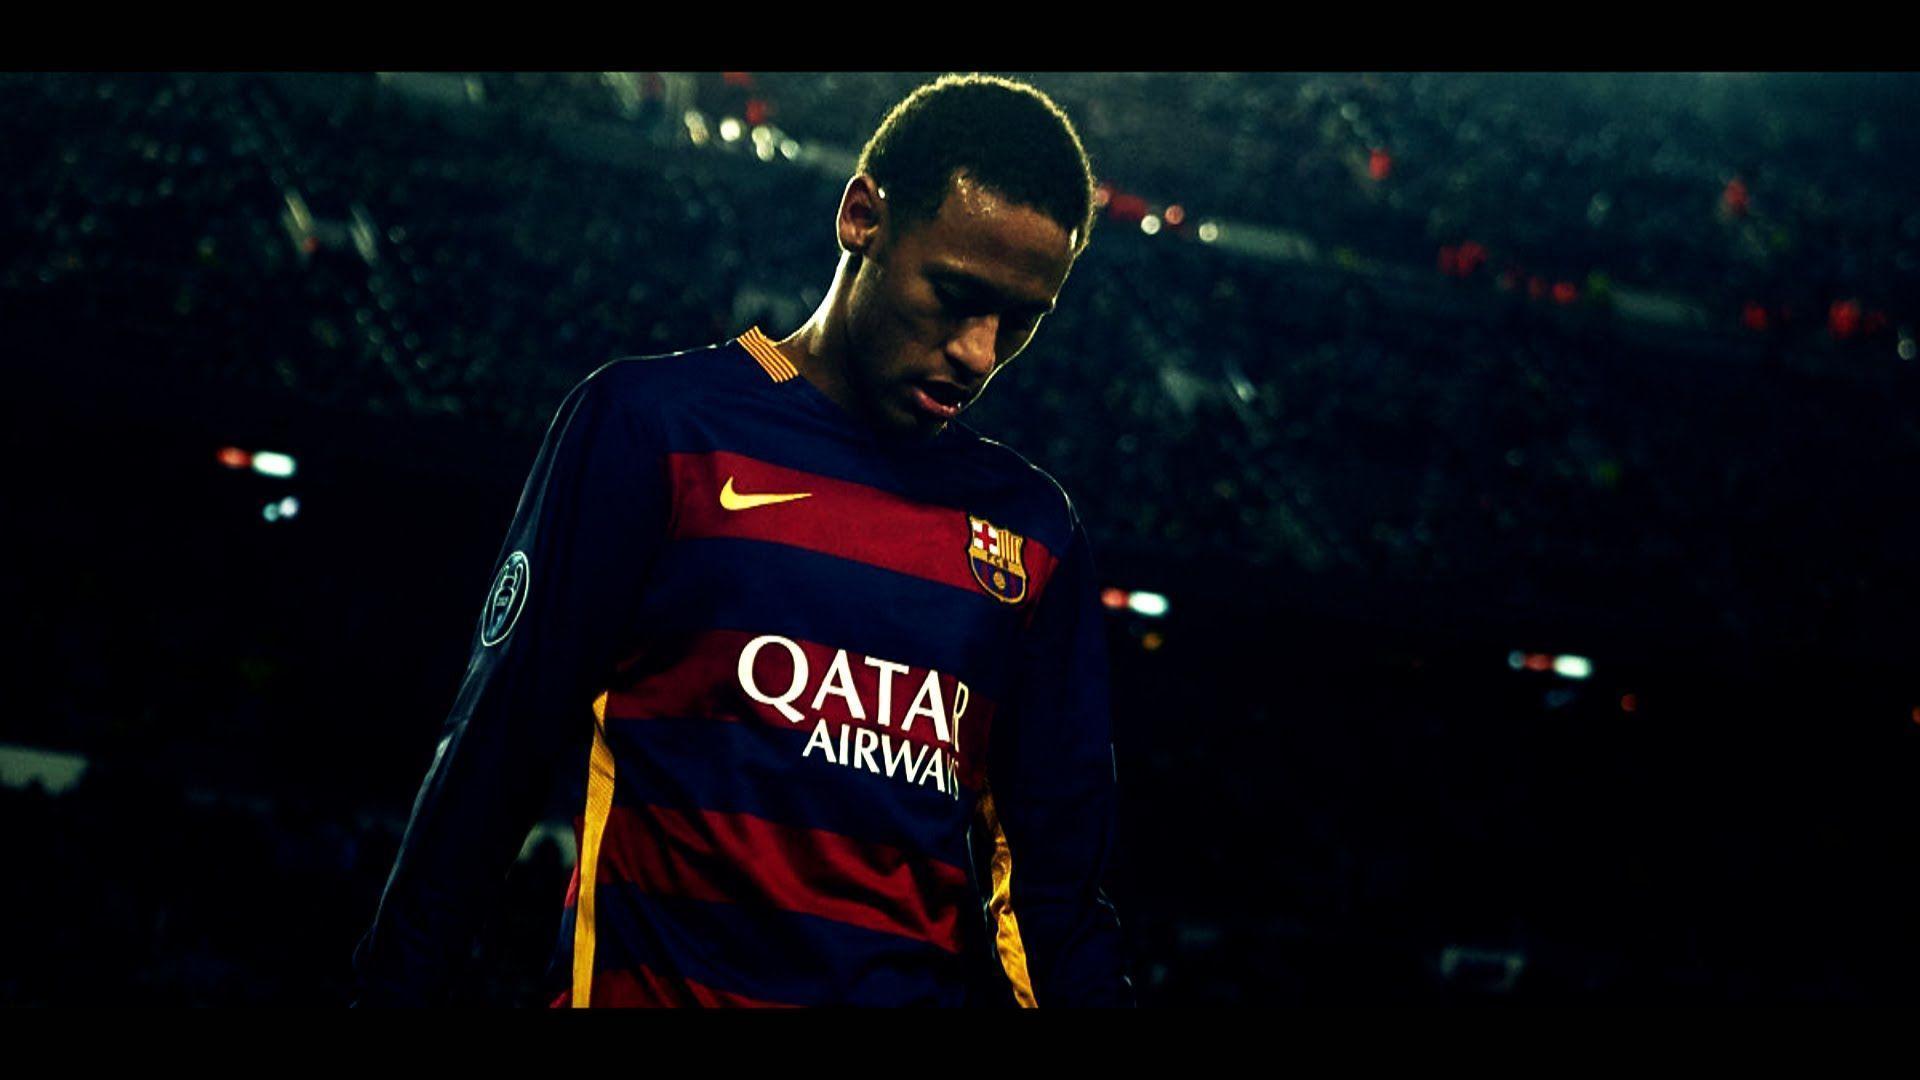 Neymar Jr Wallpapers 2016 Hd Wallpaper Cave